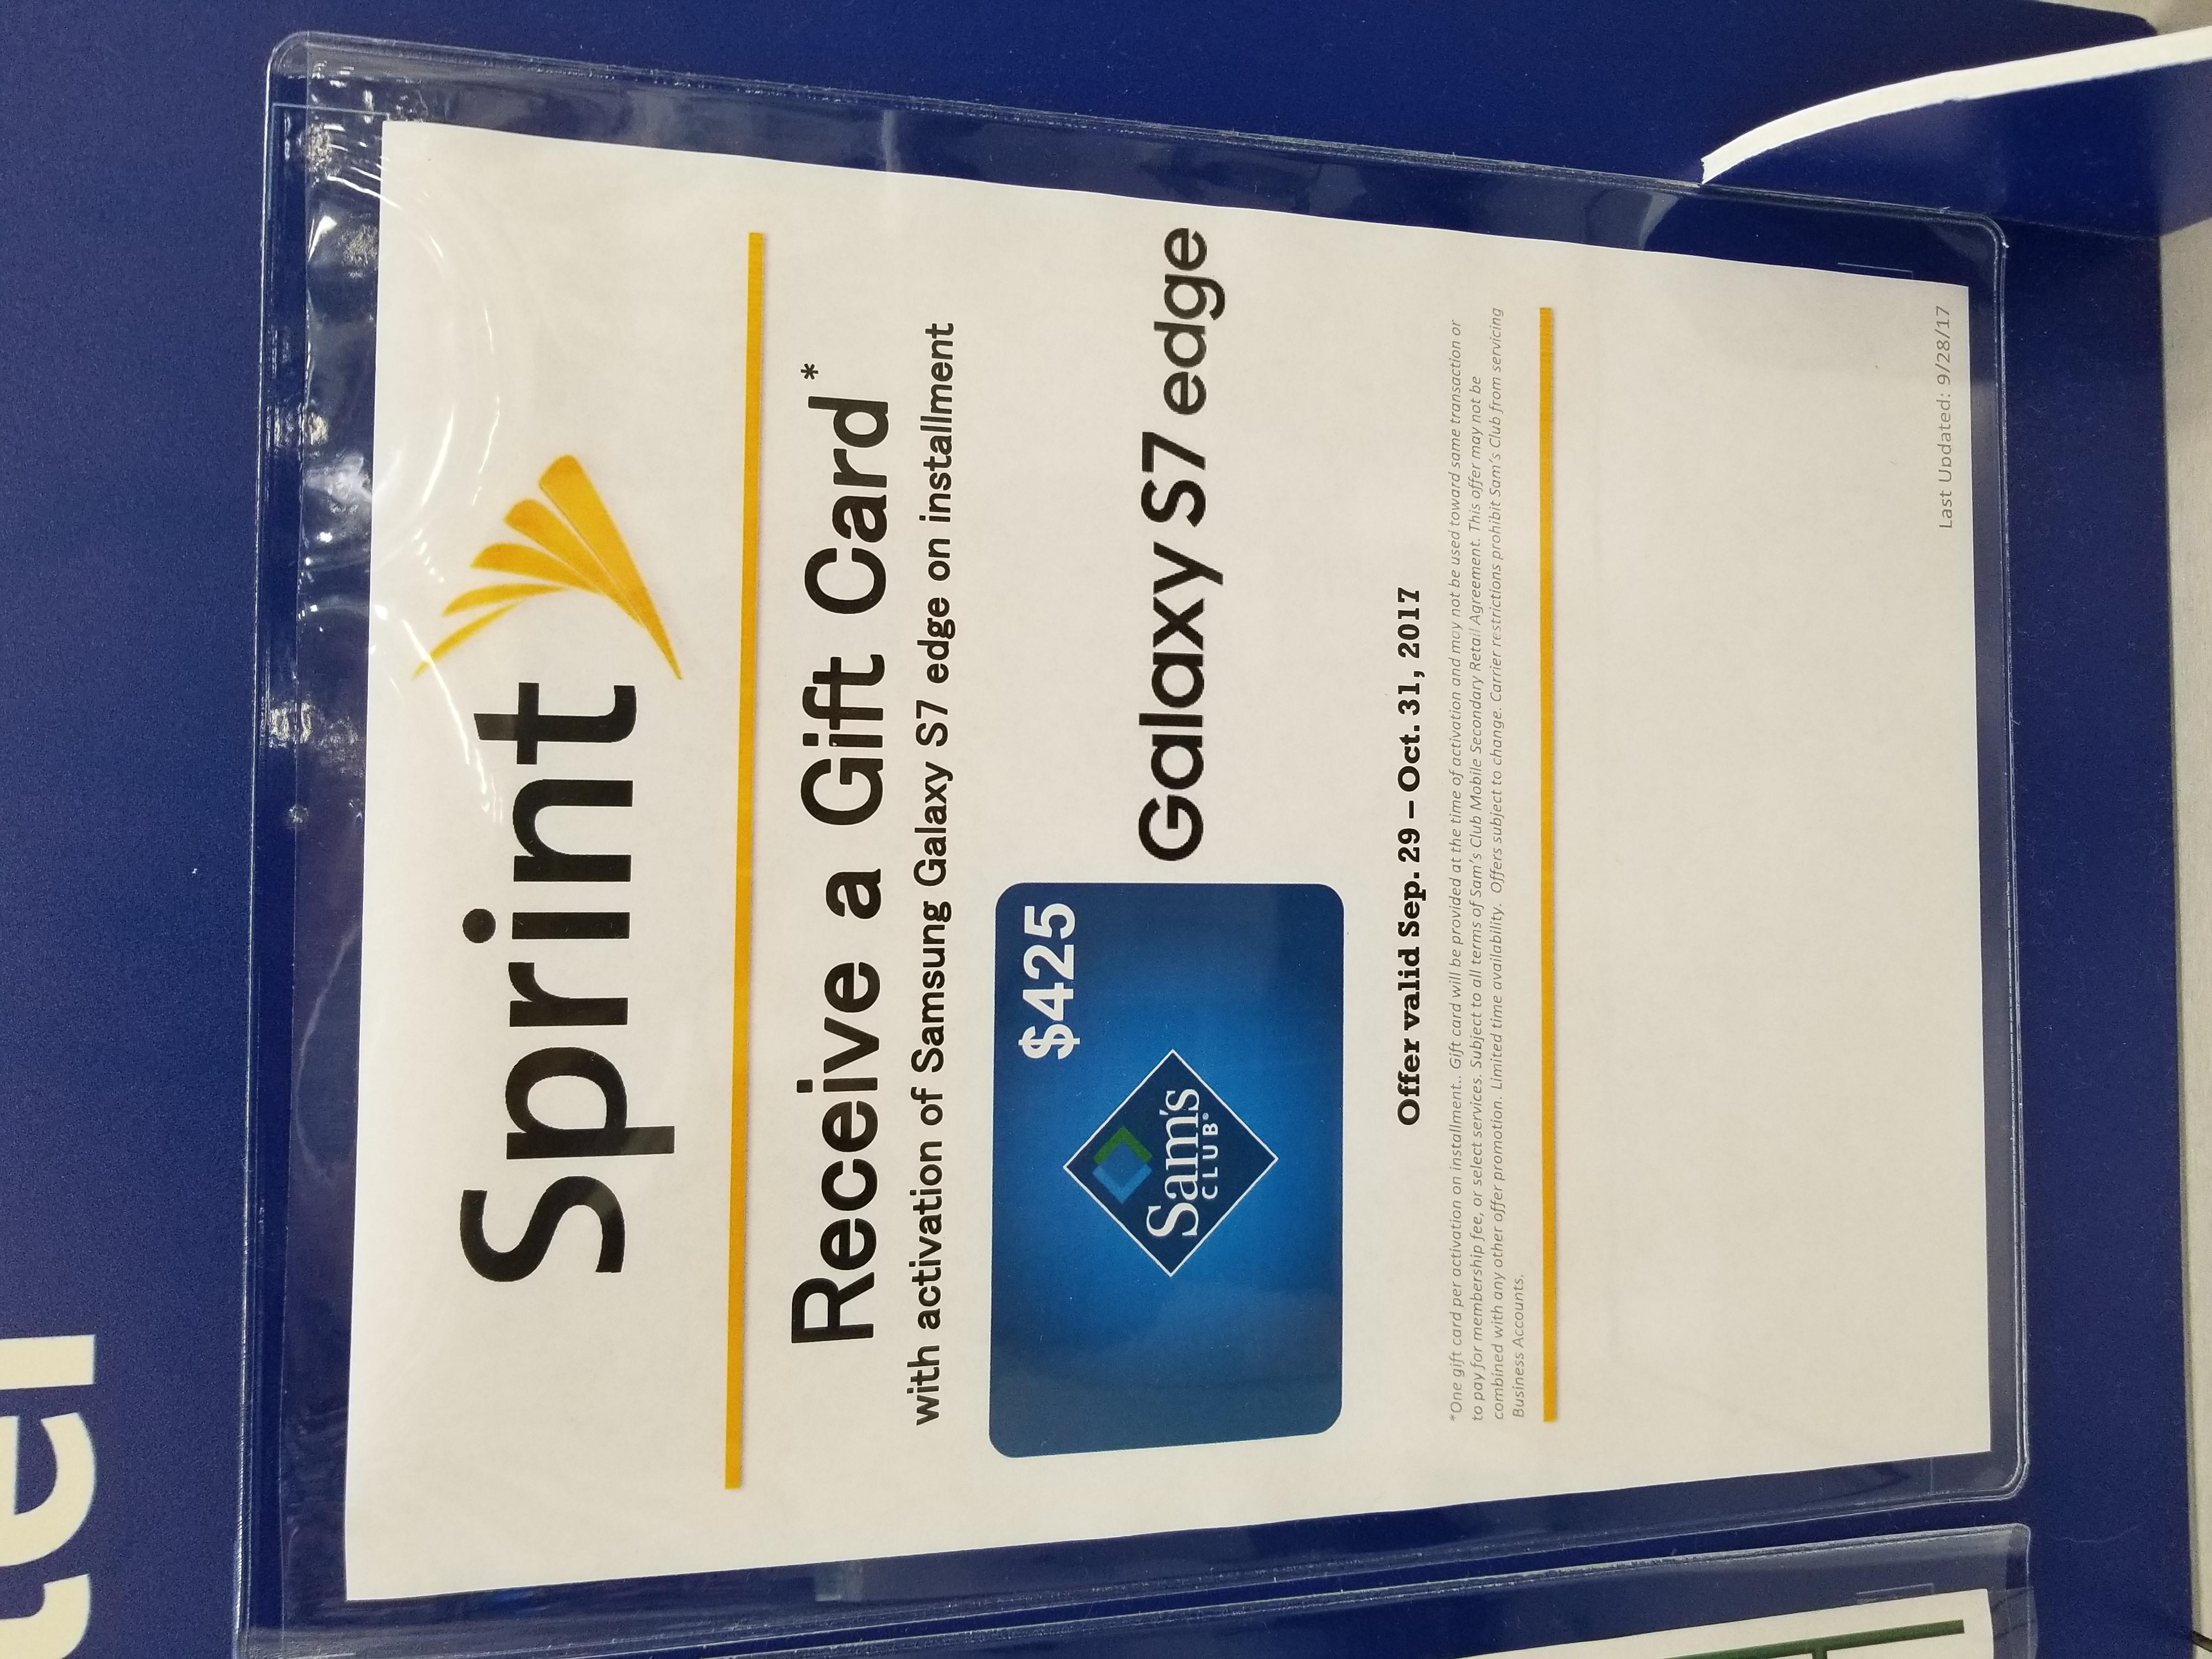 Sams Club Promotion >> Deal Alert Get A Sprint Galaxy S7 Edge From Sam S Club For 287 52